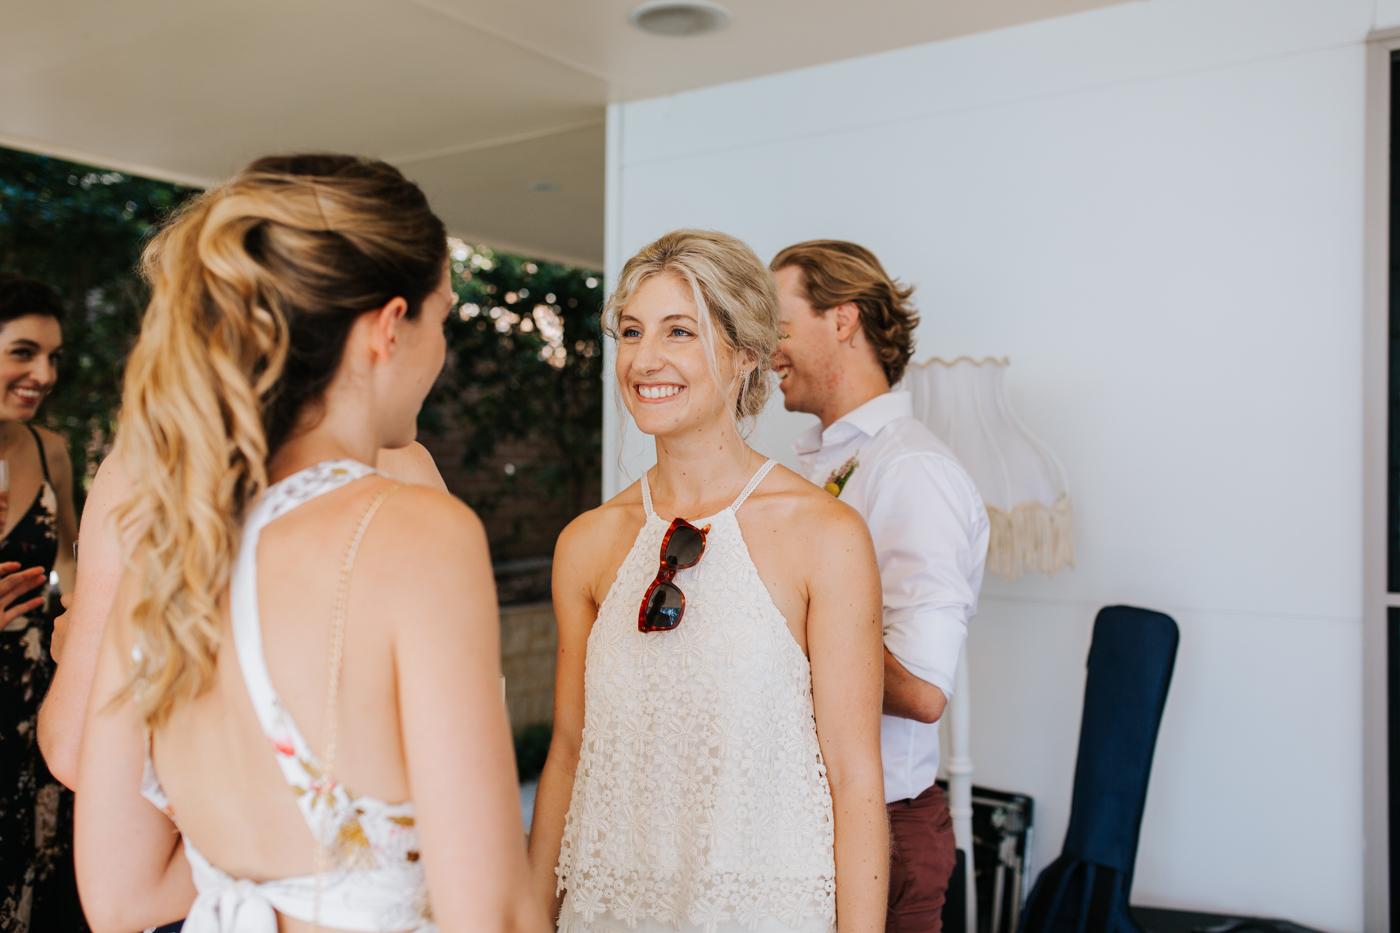 Emma & Ben - Lake Macquarie - Hunter Valley Wedding - Samantha Heather Photography-89.jpg